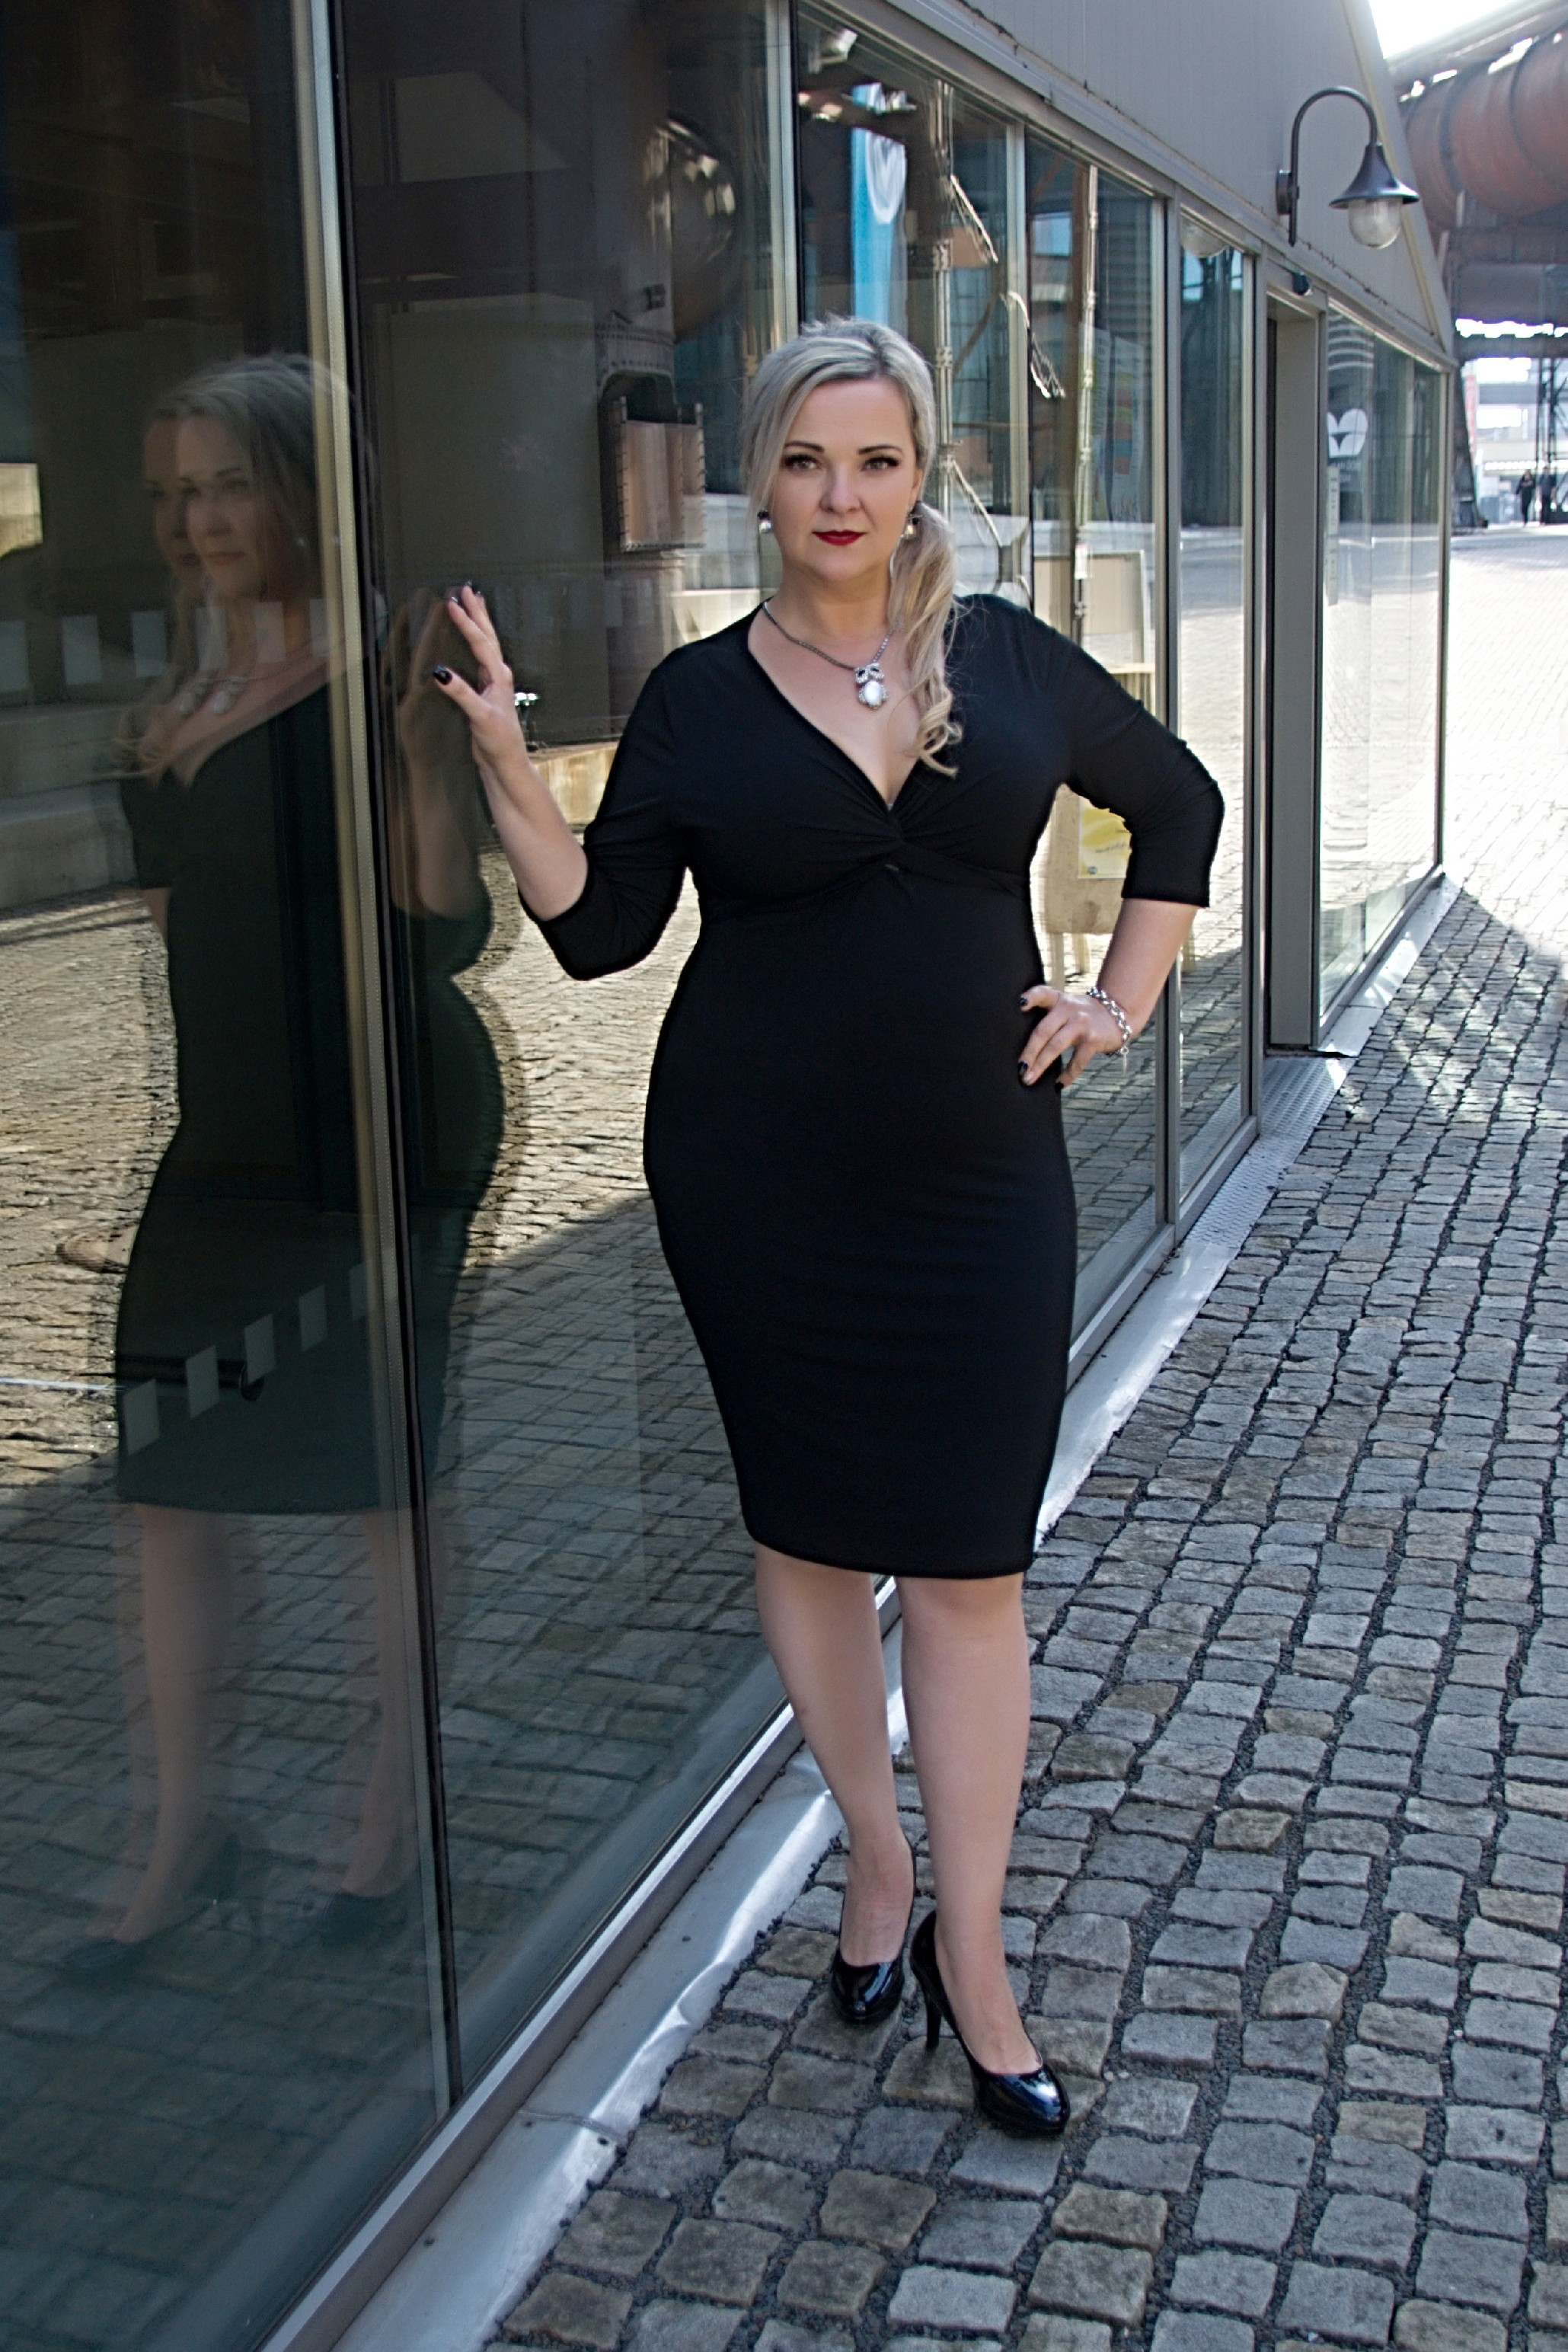 e49ac8494c9 Bellazu CZ Pouzdrové šaty Alexis Bellazu s krásným výstřihem a 3 4 rukávem  černé